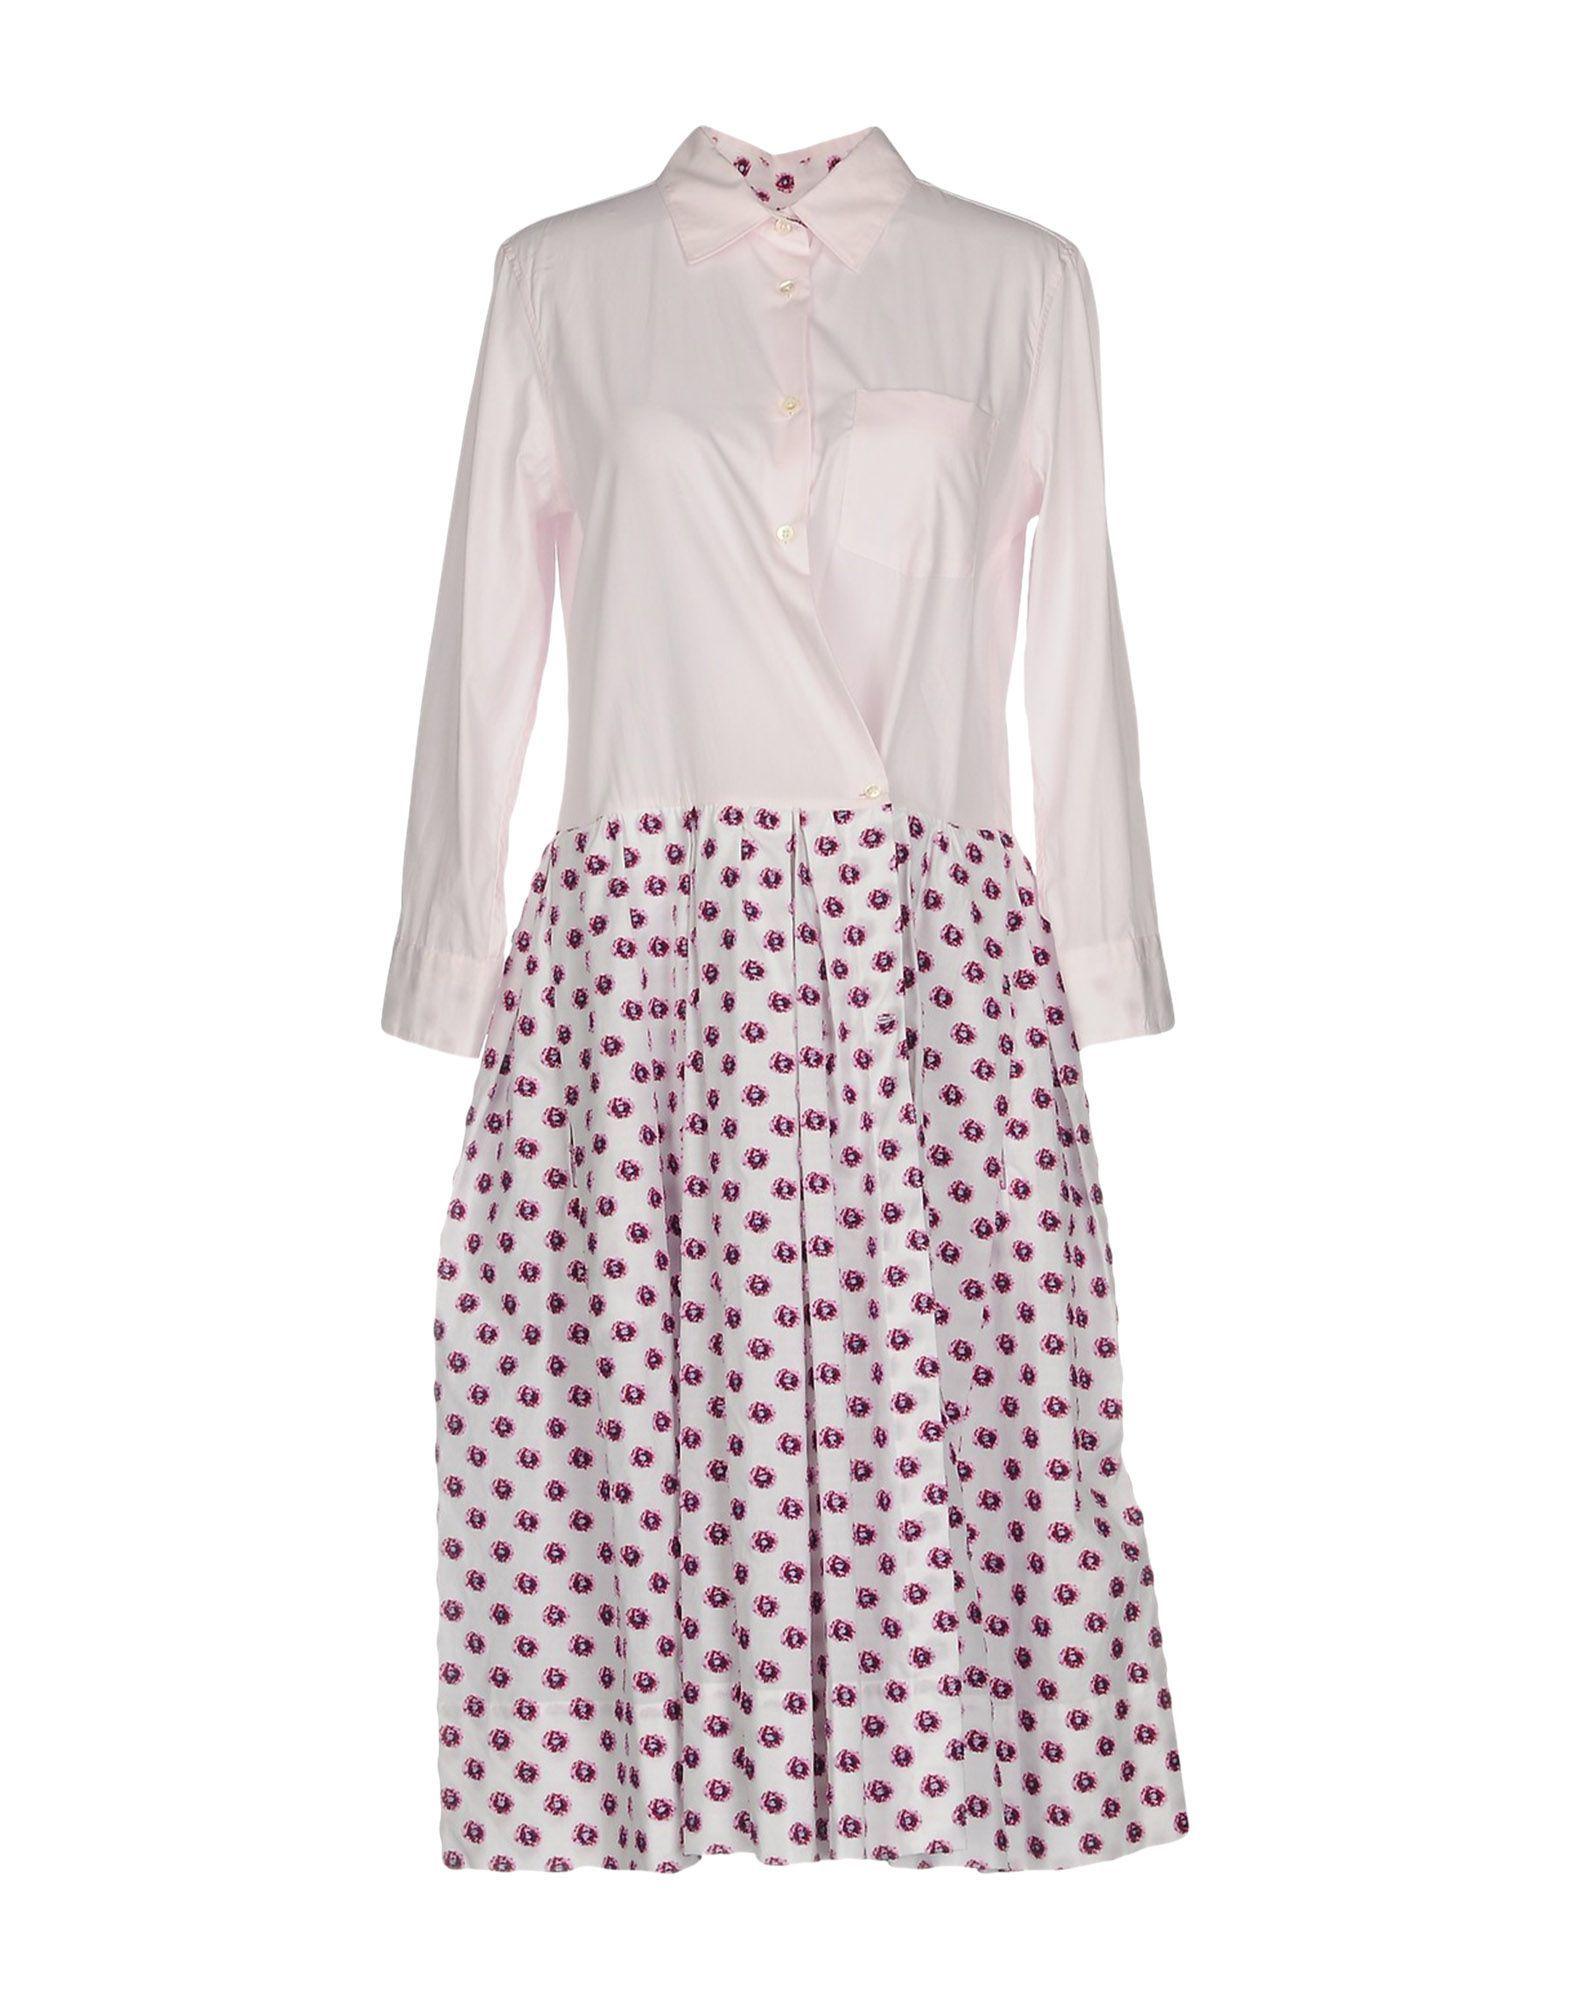 DRESSES - Knee-length dresses Sara Roka kwmxR